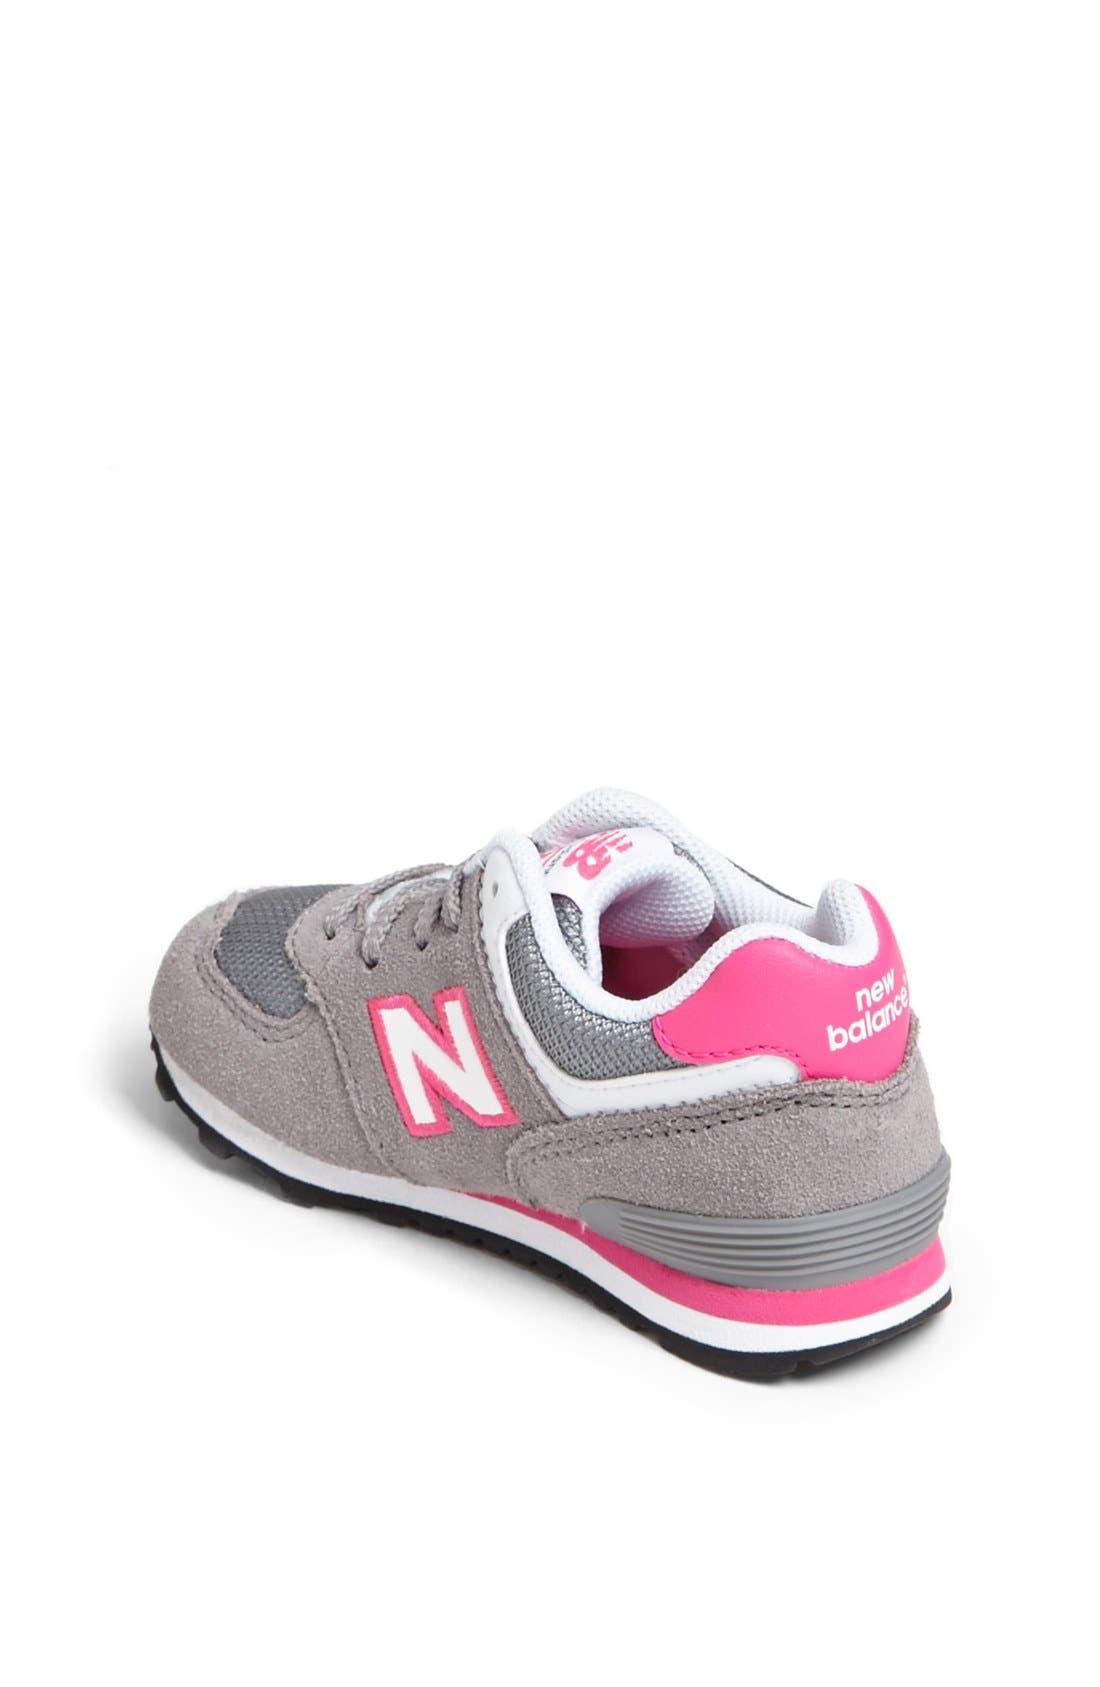 Alternate Image 2  - New Balance '574' Running Shoe (Baby, Walker & Toddler)